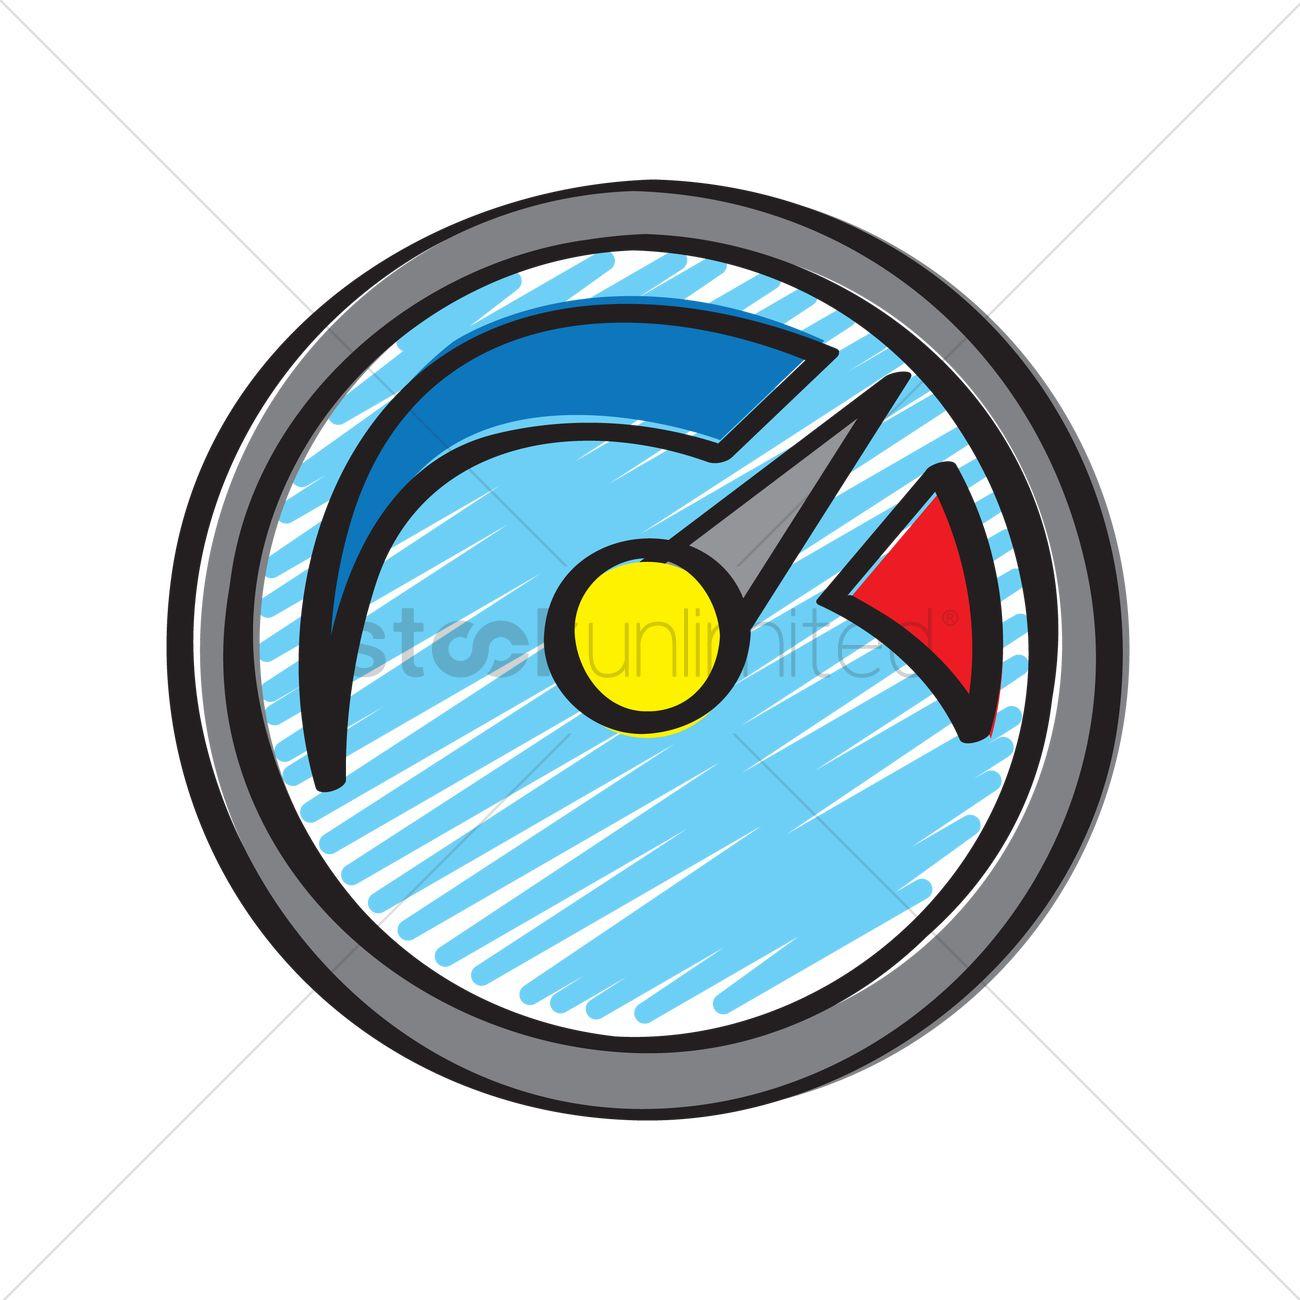 Free Illustration of a fuel gauge Vector Image - 1234820